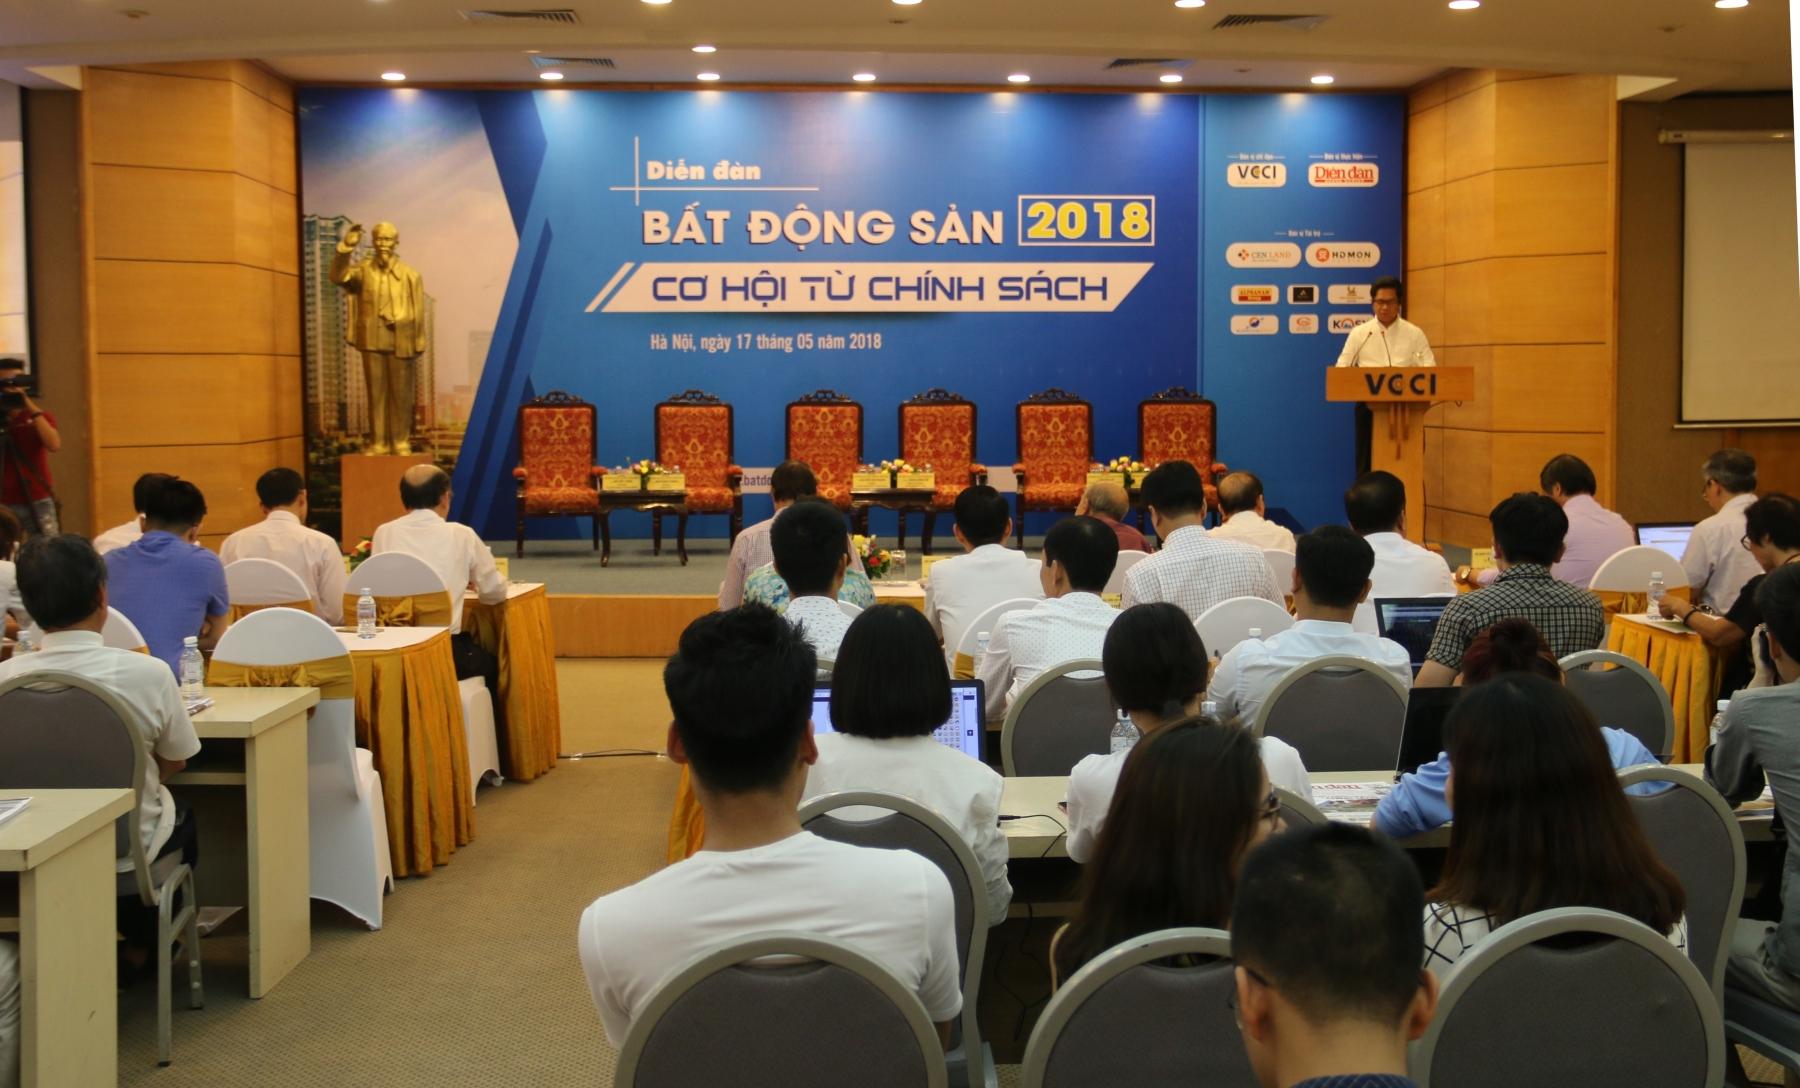 thi truong bat dong san 2018 co hoi tu chinh sach